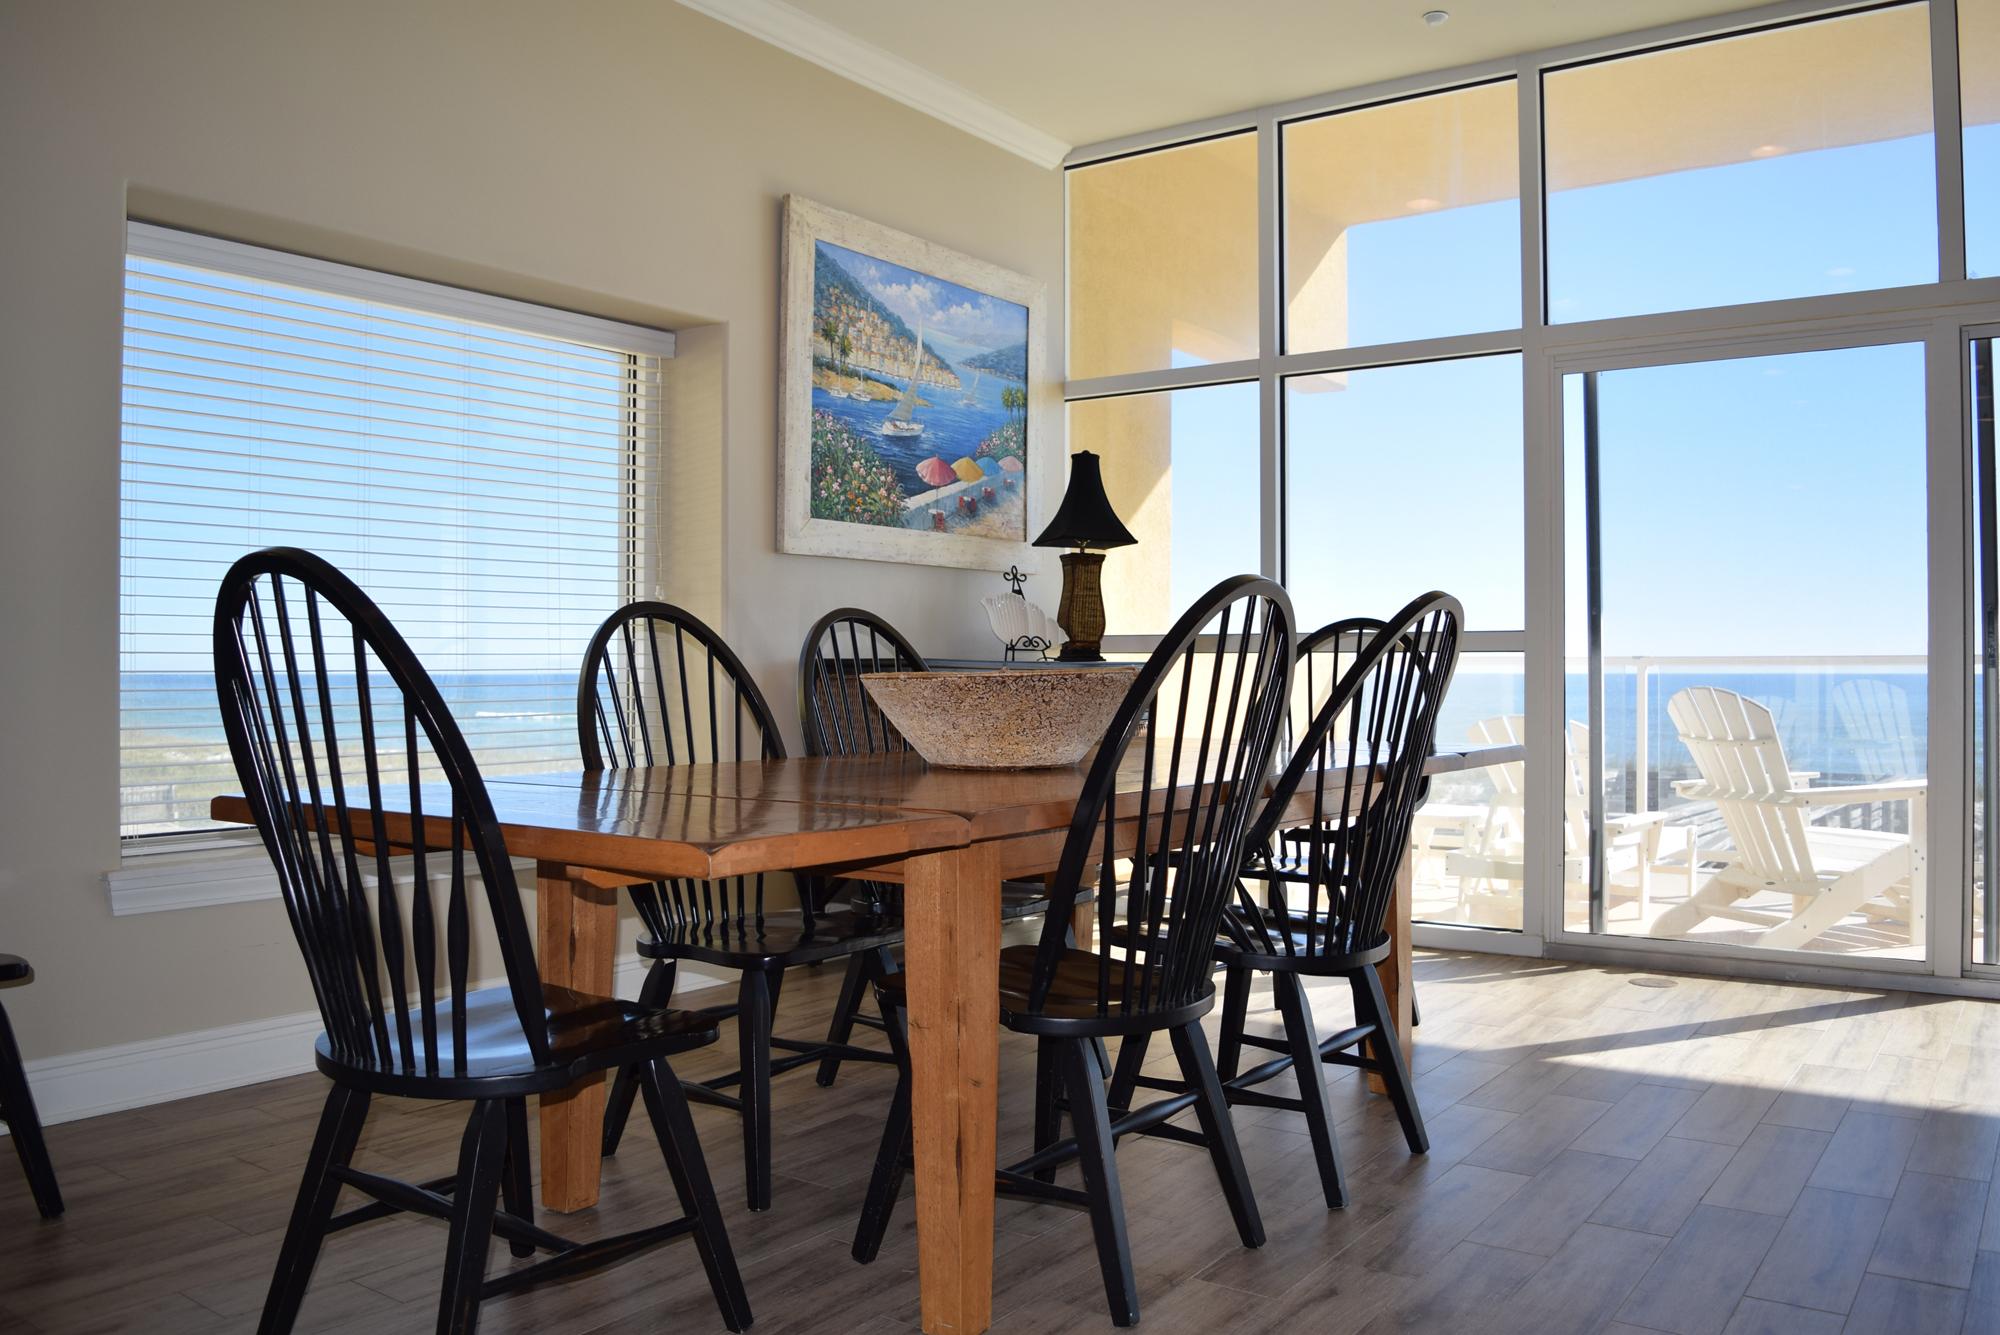 Regency Cabanas #B1 Condo rental in Regency Cabanas Pensacola Beach in Pensacola Beach Florida - #5